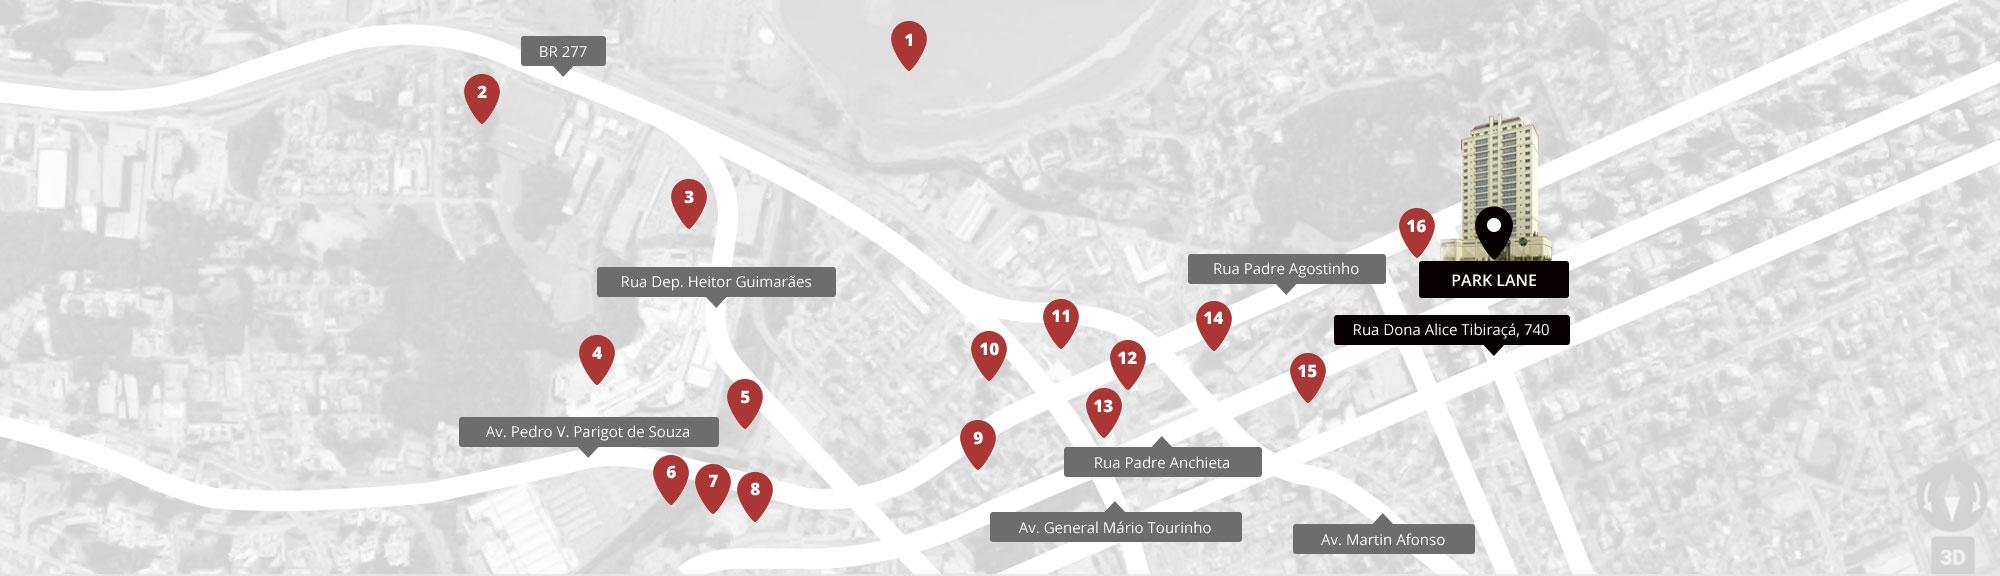 http://www.portofeliz.com/lake-tower/wp-content/uploads/2016/05/mapa.jpg